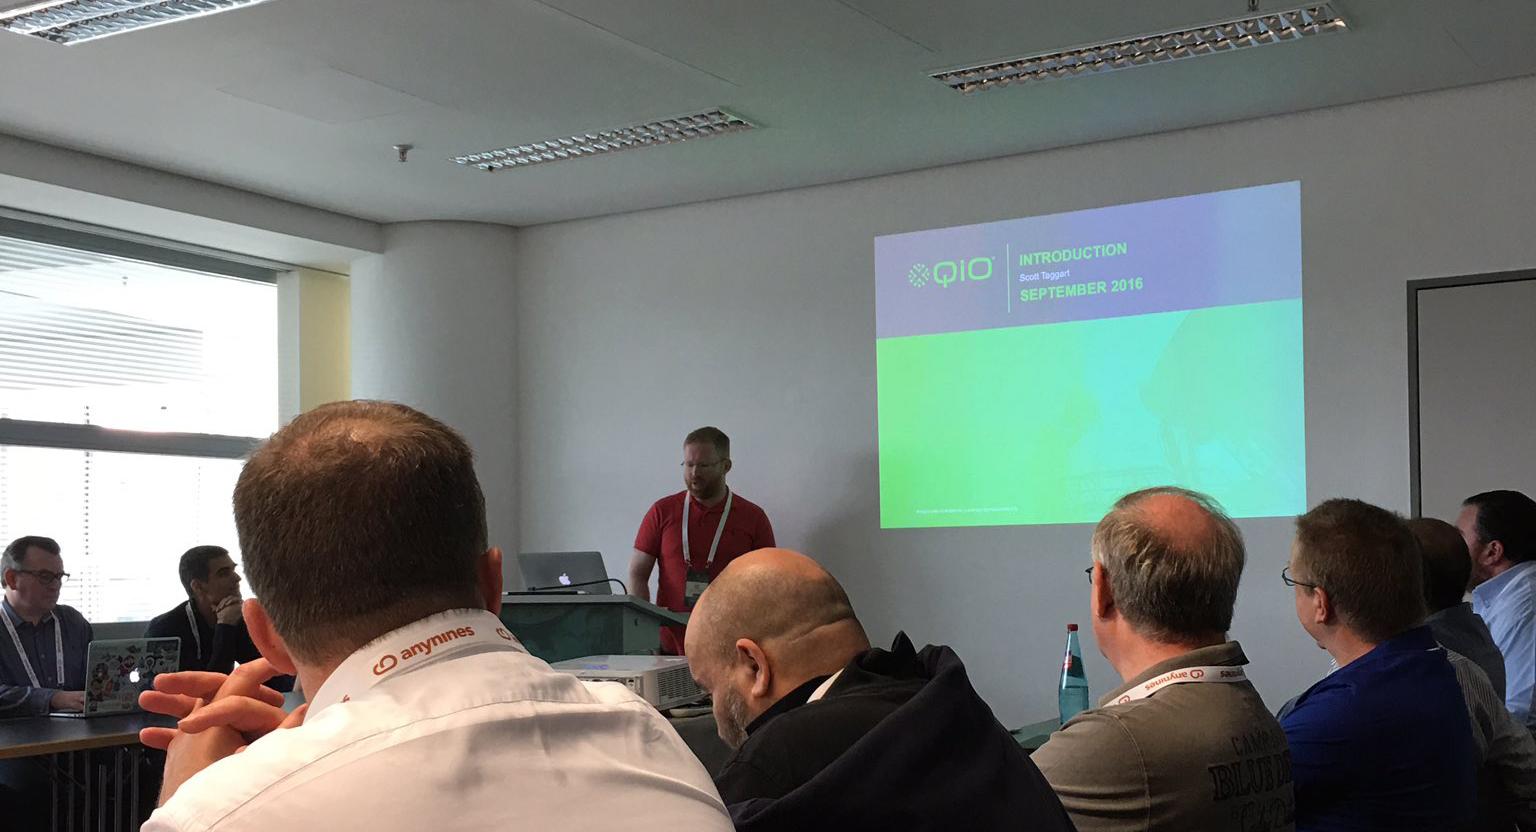 cfsummit cloud foundry summit europe QiO Scott Taggart 2